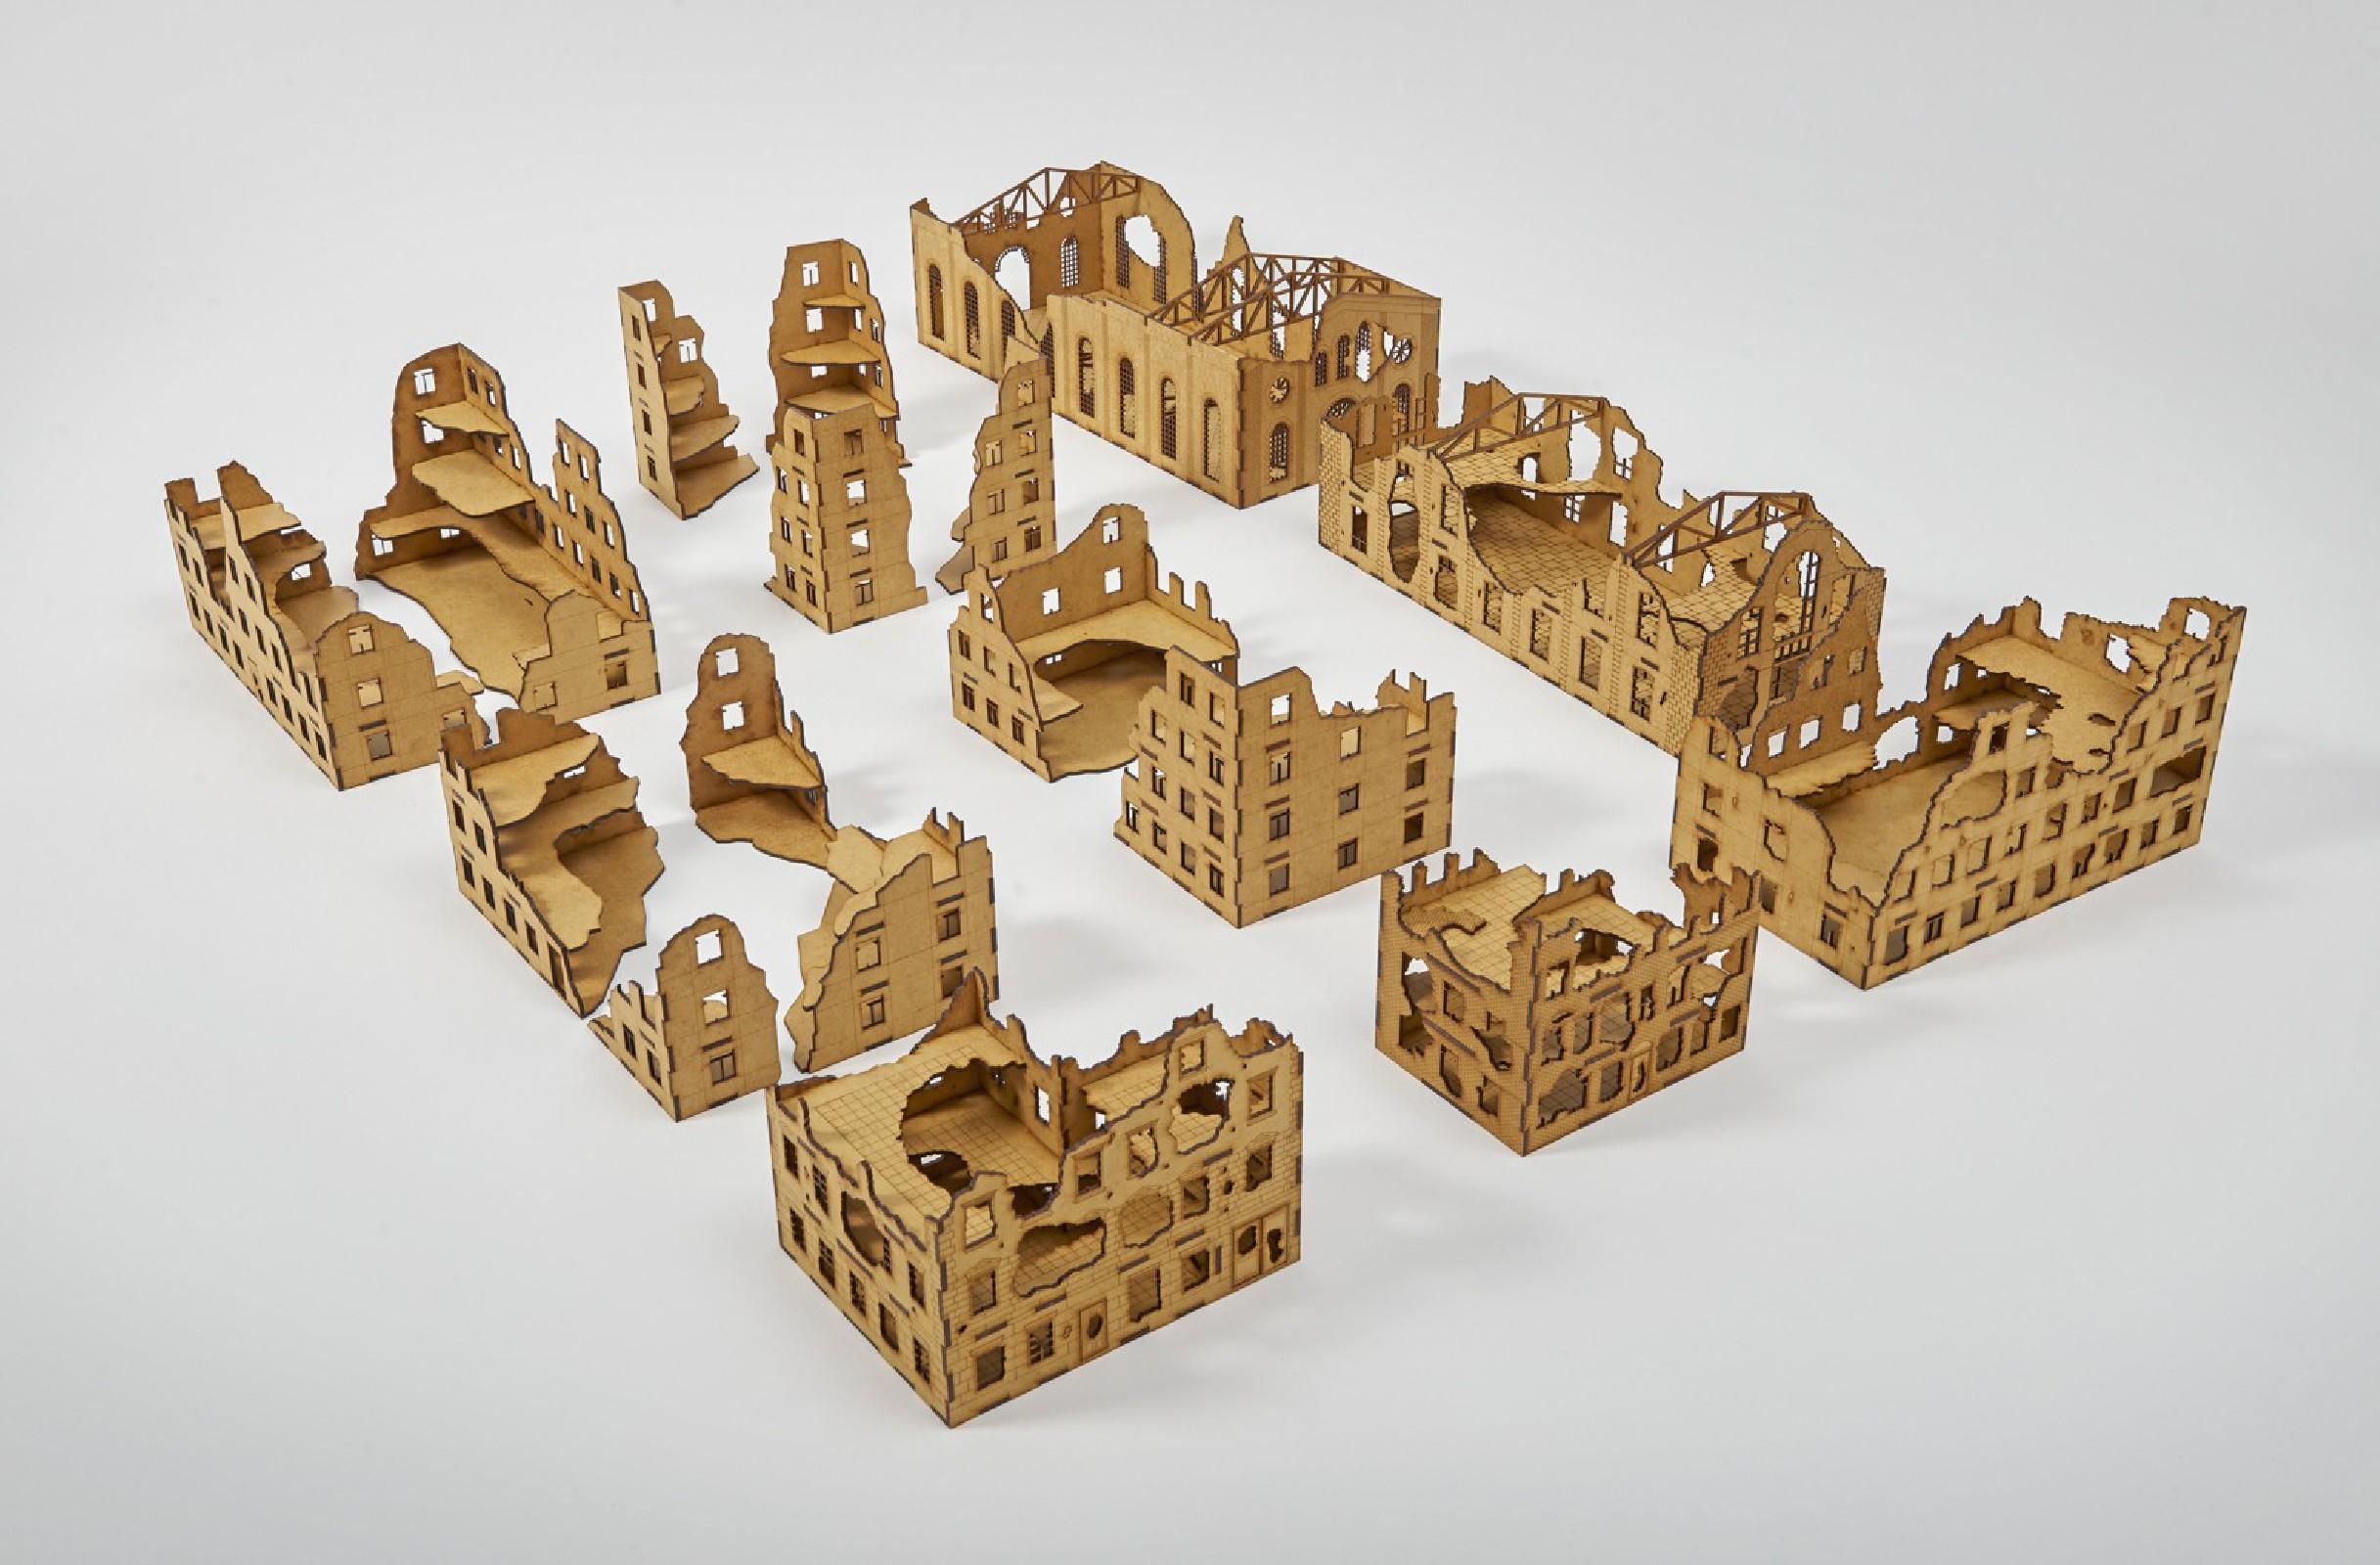 LAser Cut RUINED CITY Set 20mm